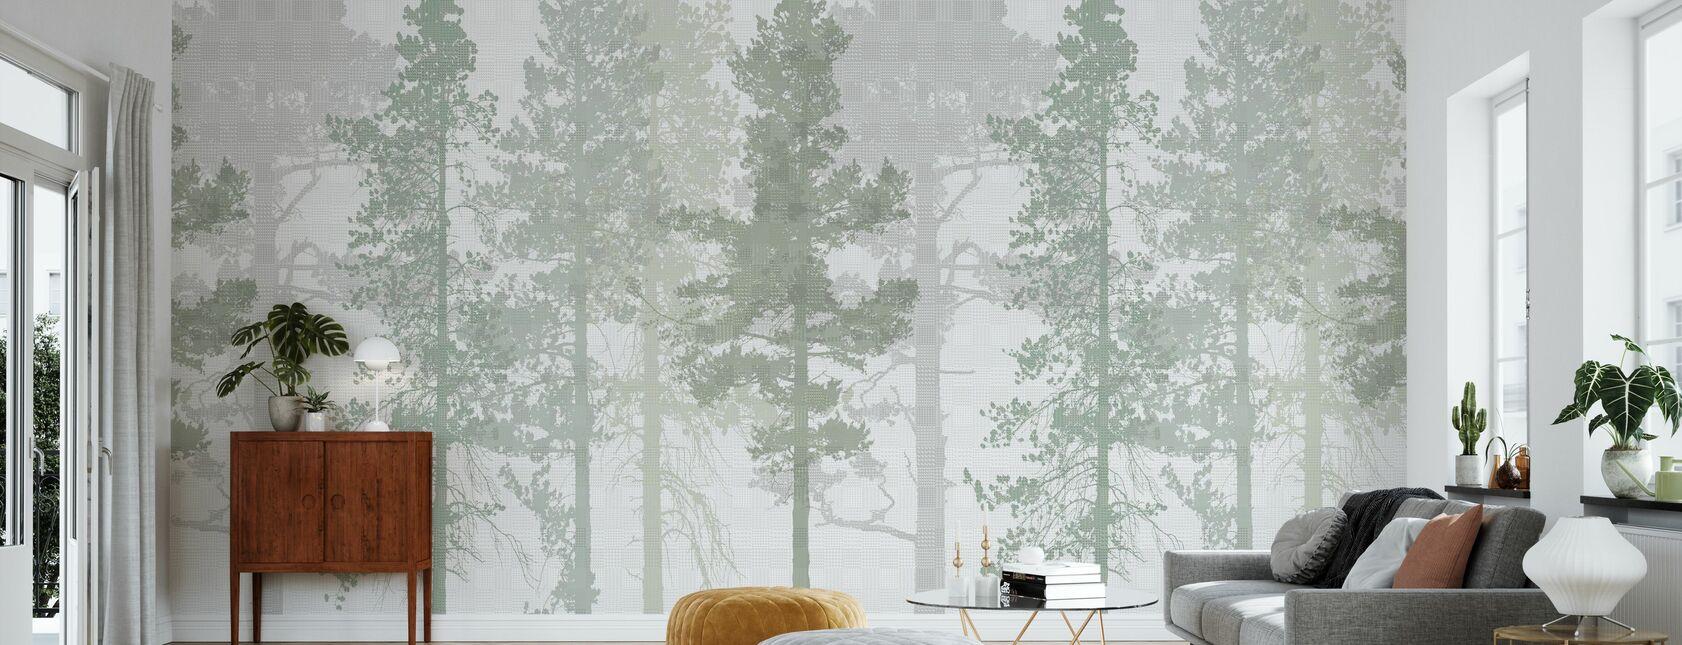 Tissage Bois Vert Cool - Papier peint - Salle à manger